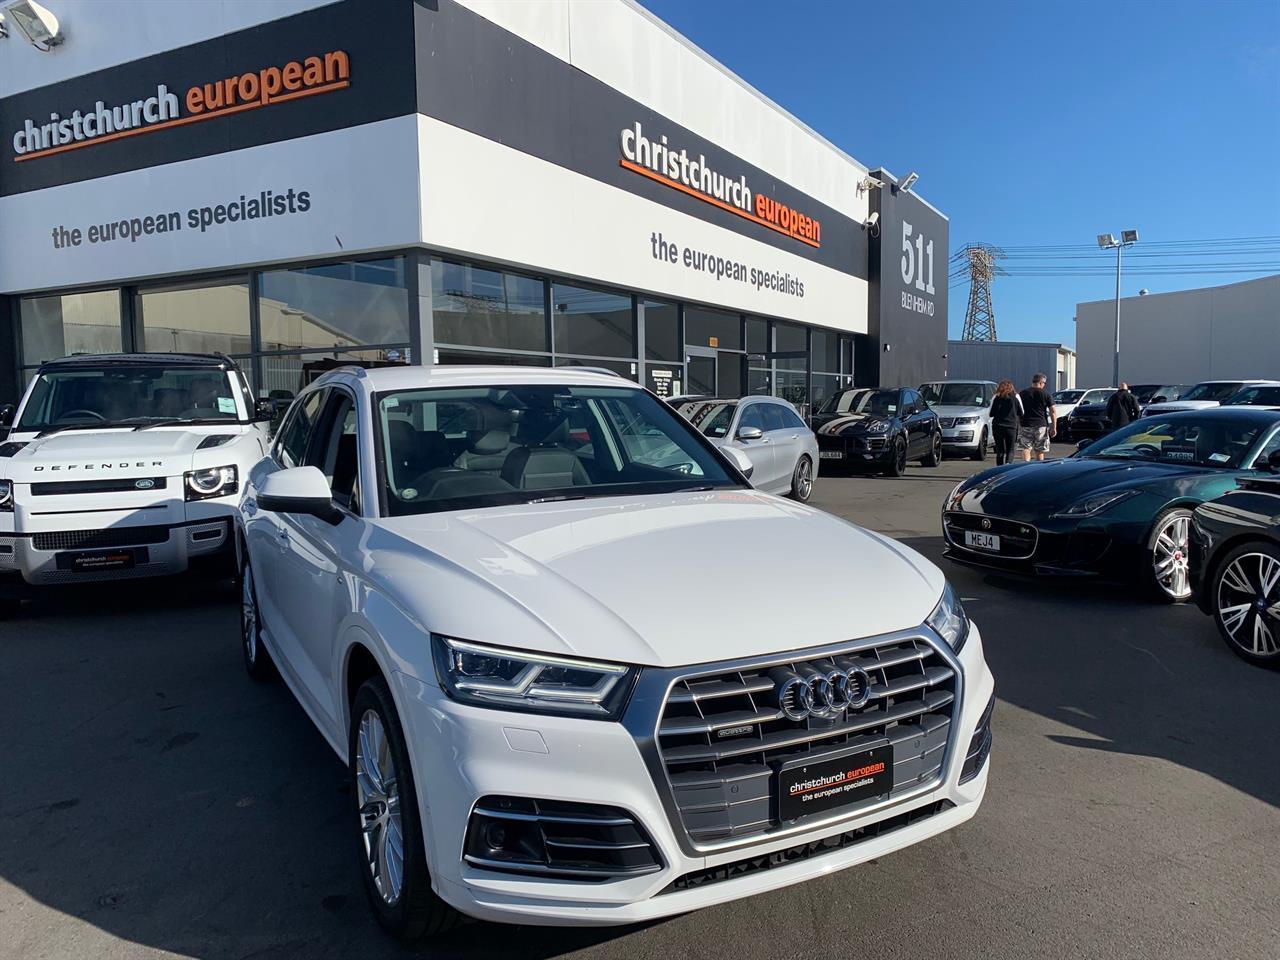 image-1, 2017 Audi Q5 2.0T FSI New Model Quattro at Christchurch